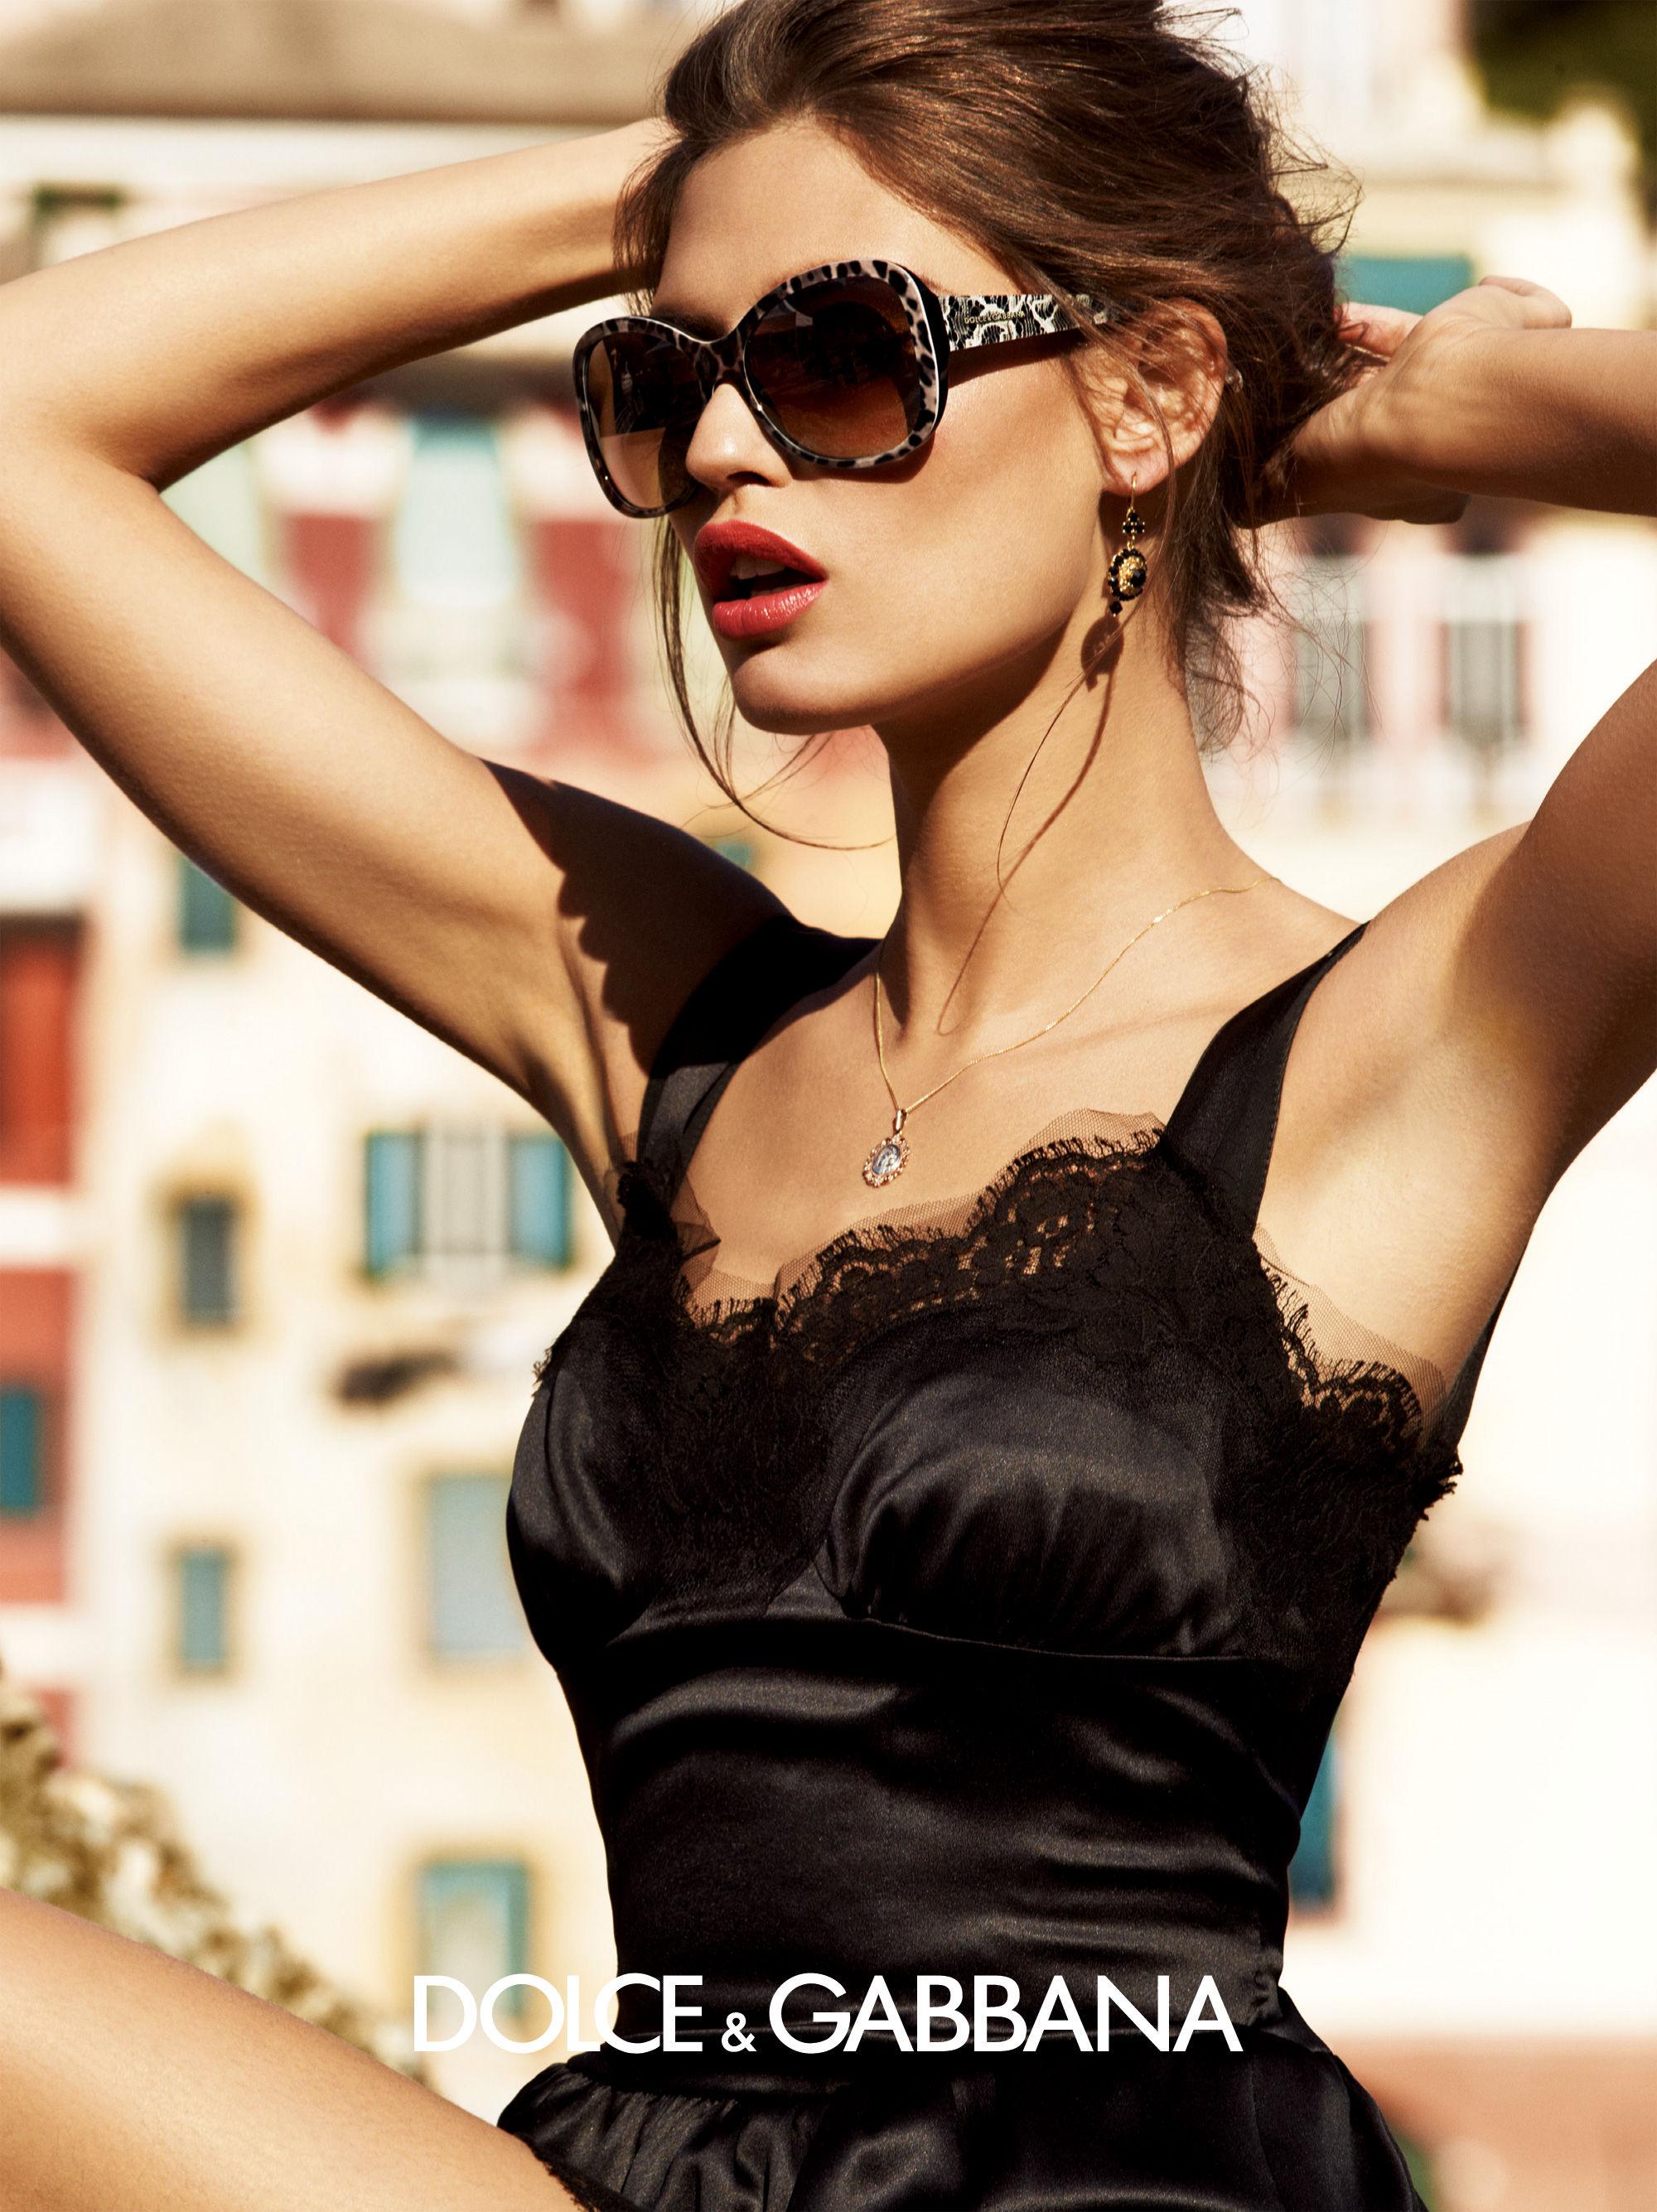 Monica-Bellucci-Bianca-Balti-Giampaolo-Sgura-Photoshoot-for-Dolce-Gabbana-SS-2012-Photo-6.jpg